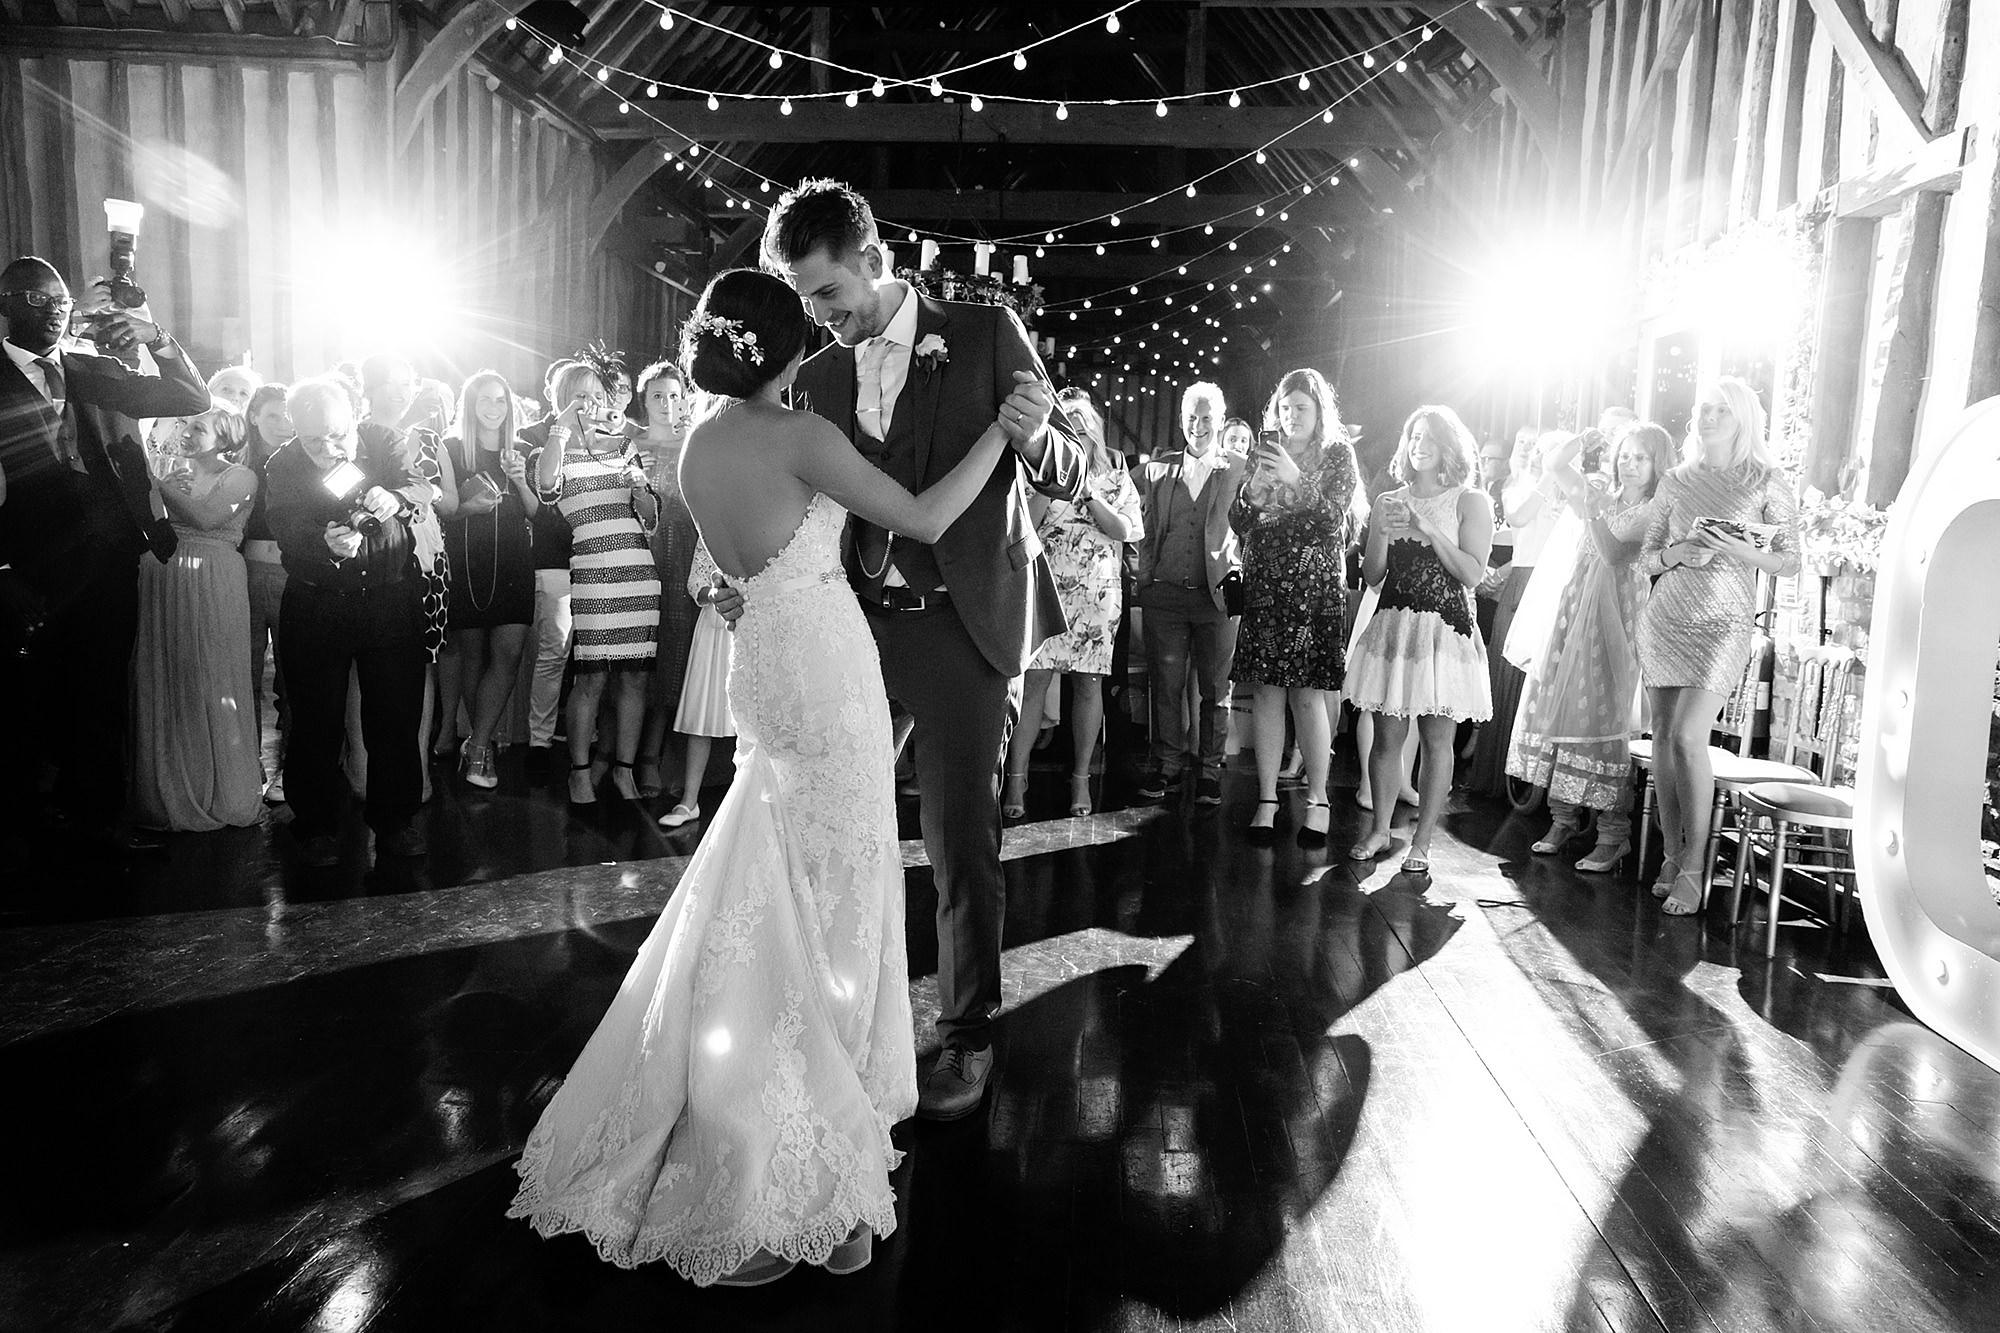 Lillibrooke Manor wedding bride and groom dance together